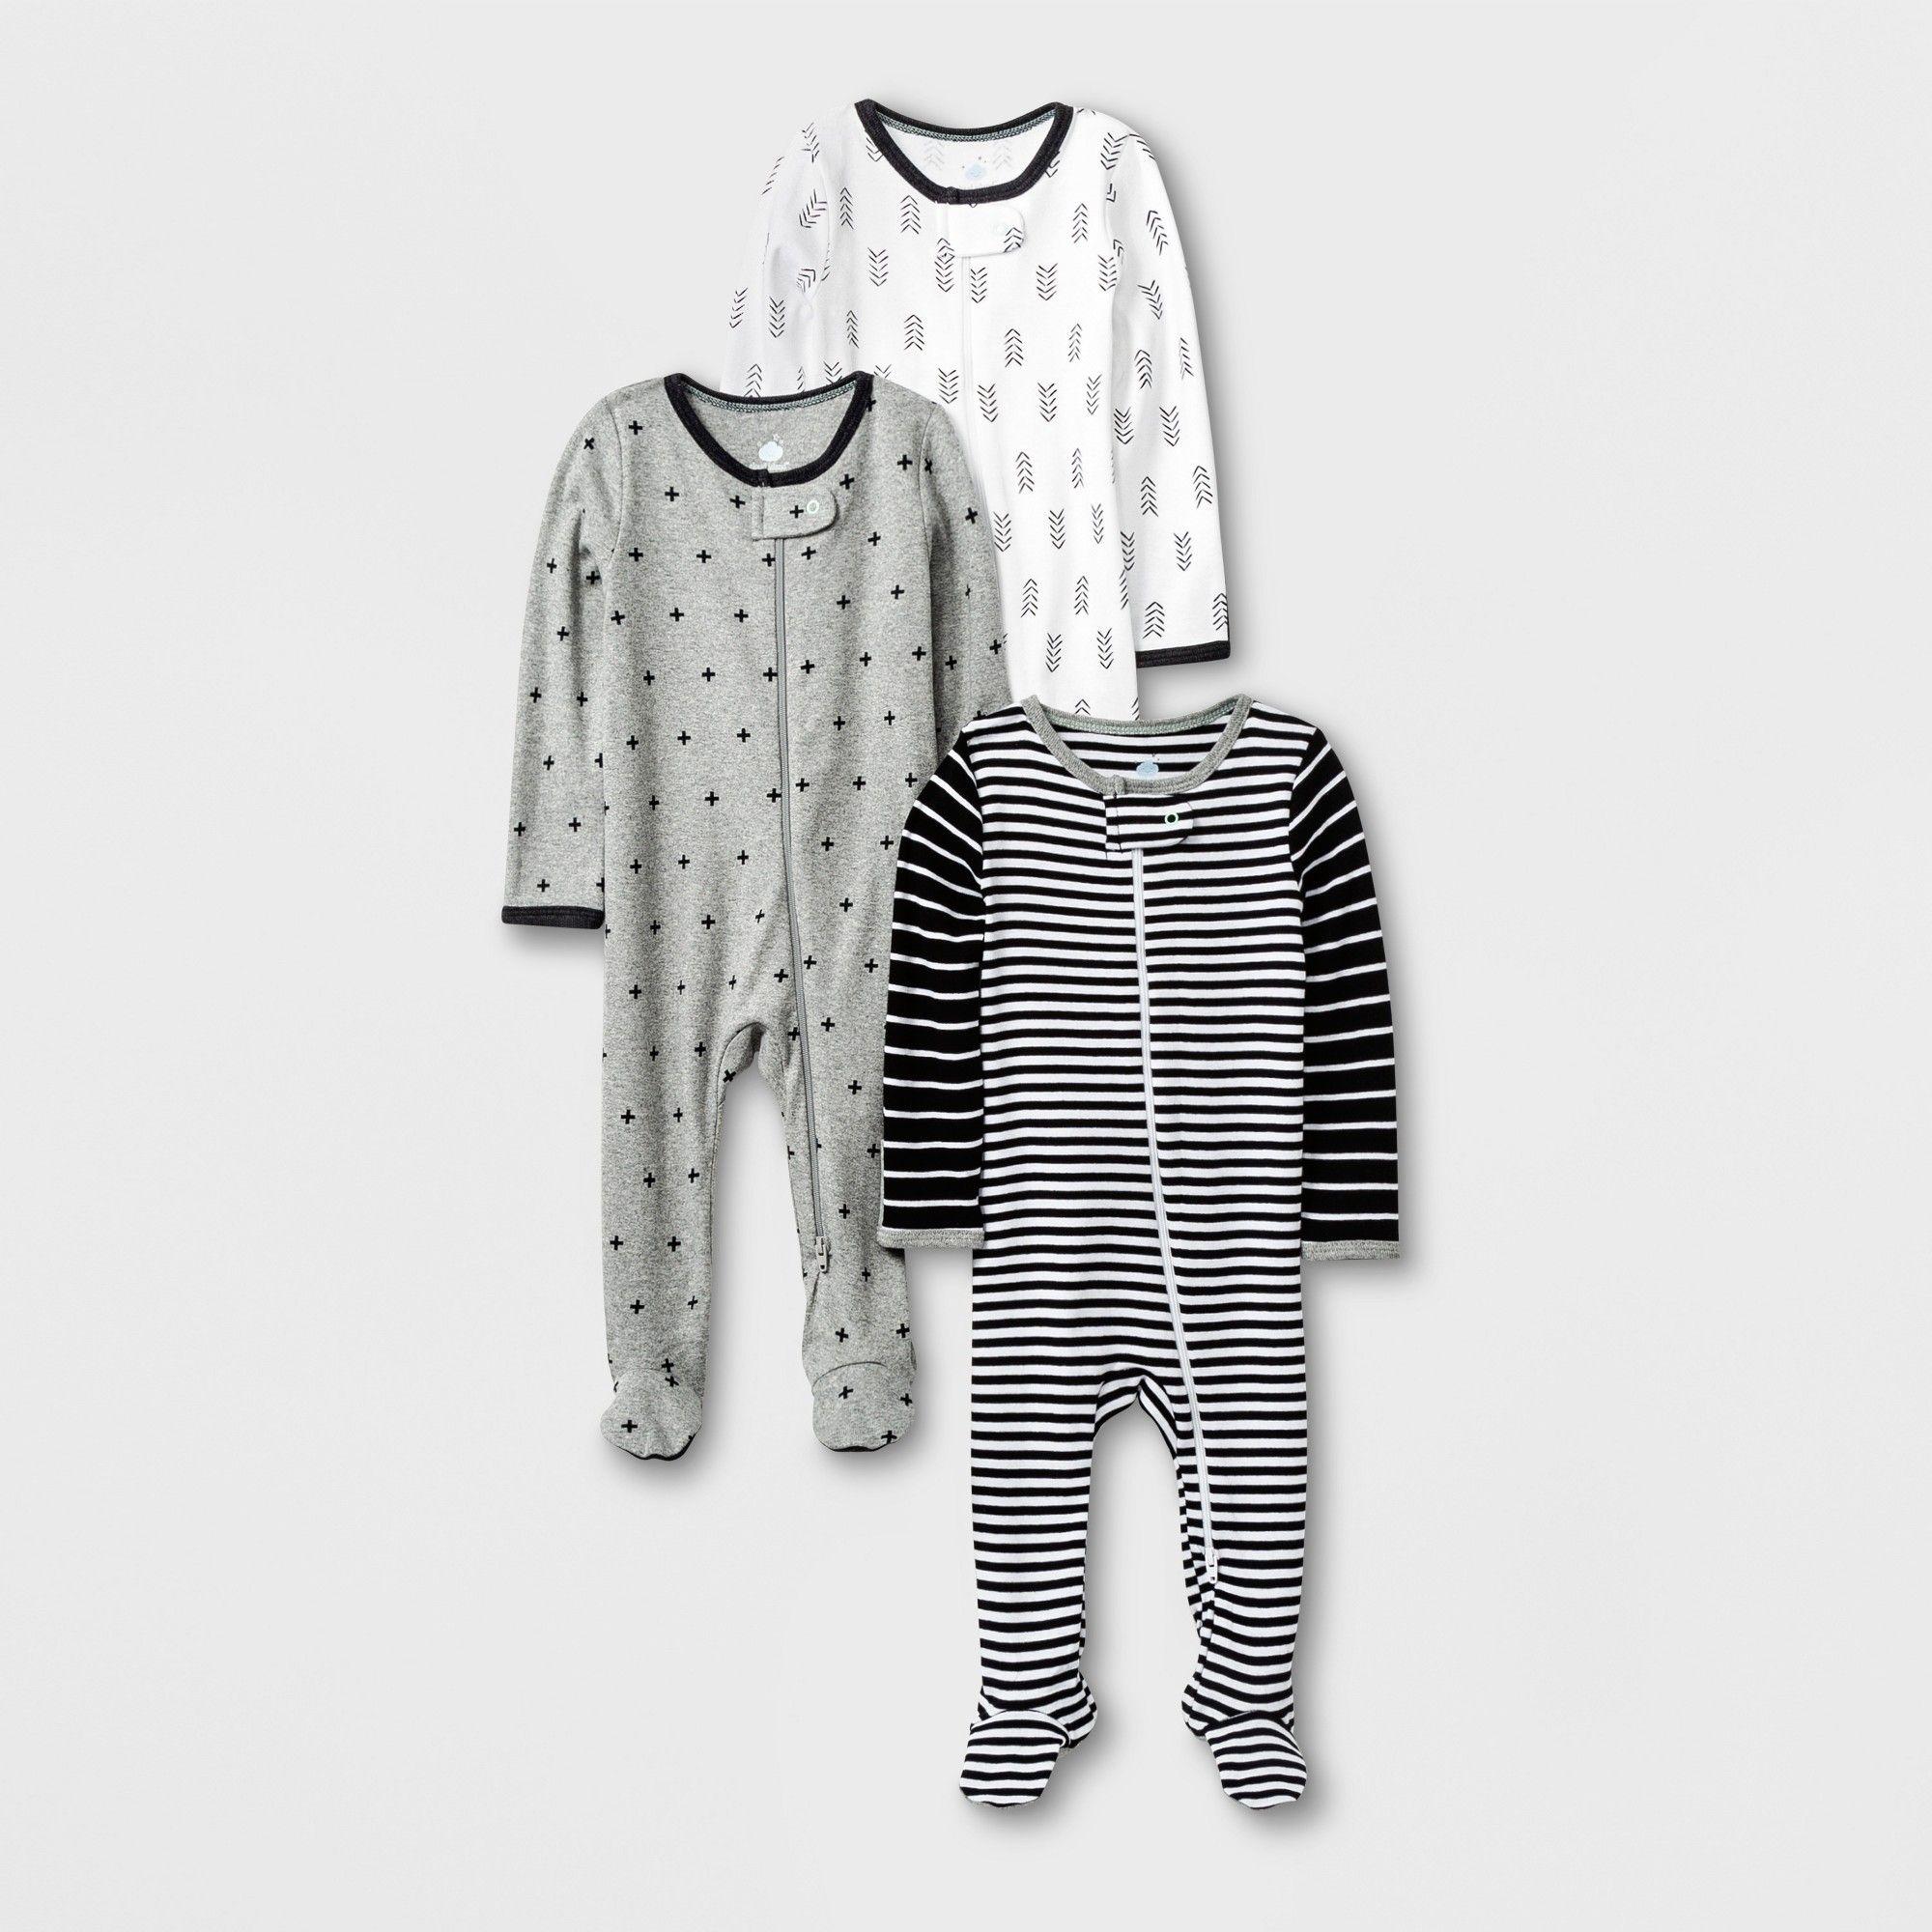 314e5cc1a Baby 3pk Long Sleeve Pajama Set - Cloud Island Black/White/Gray Newborn,  Newborn Unisex